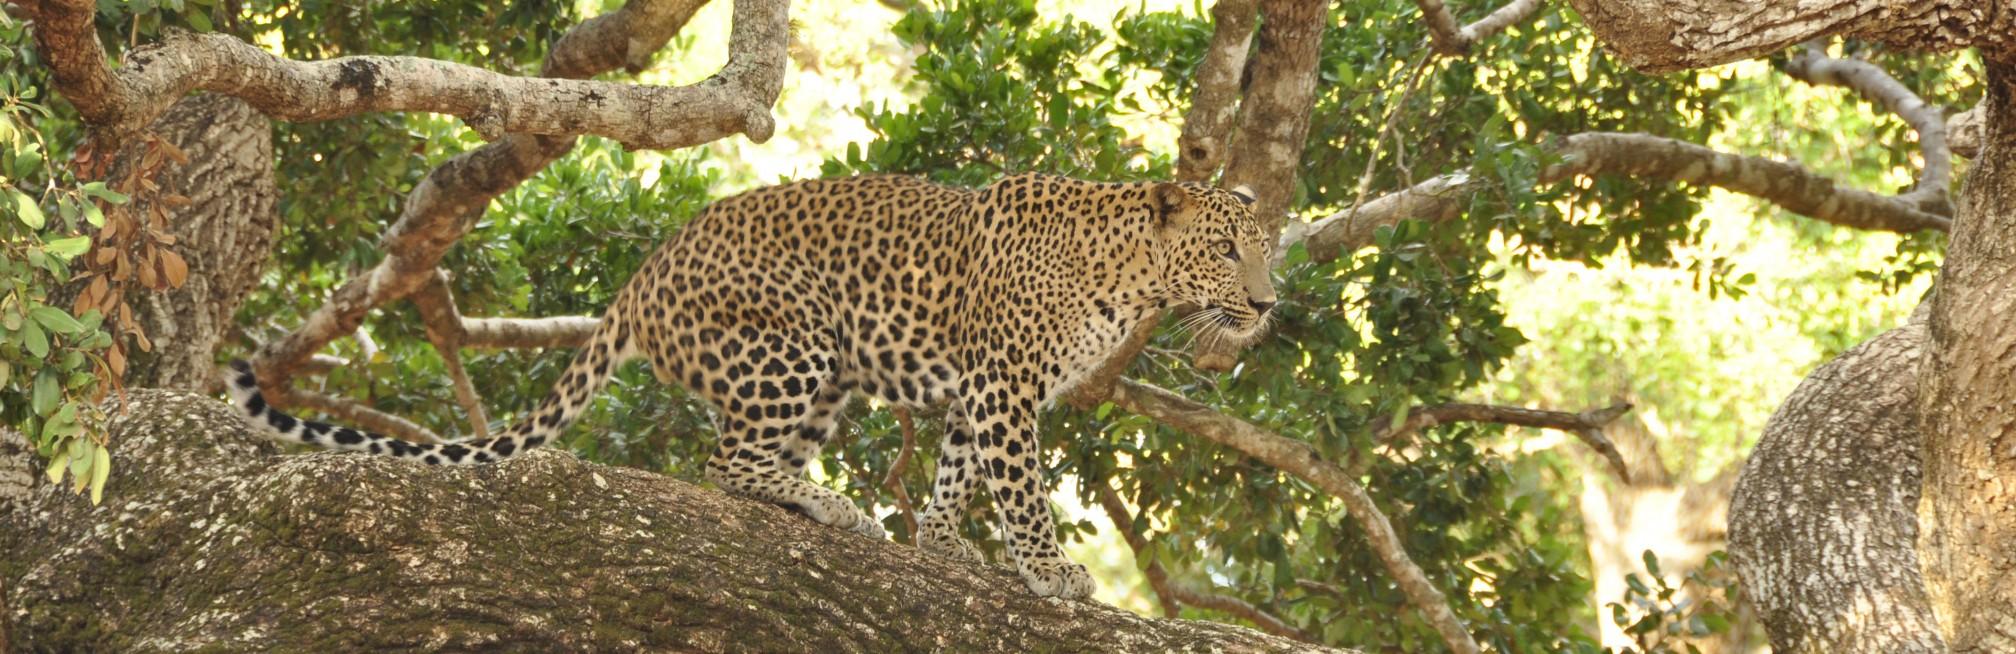 A spectacular Sri Lankan safari